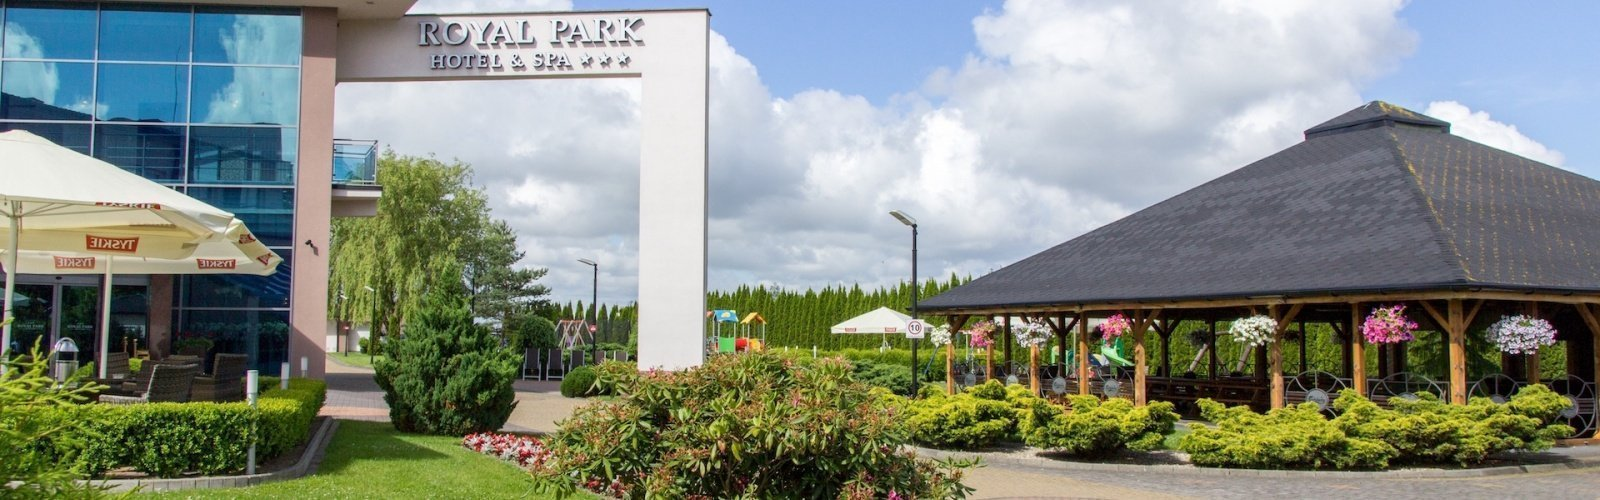 Royal Park Hotel & SPA zdobywa certyfikat jakości 2017 od TripAdvisor